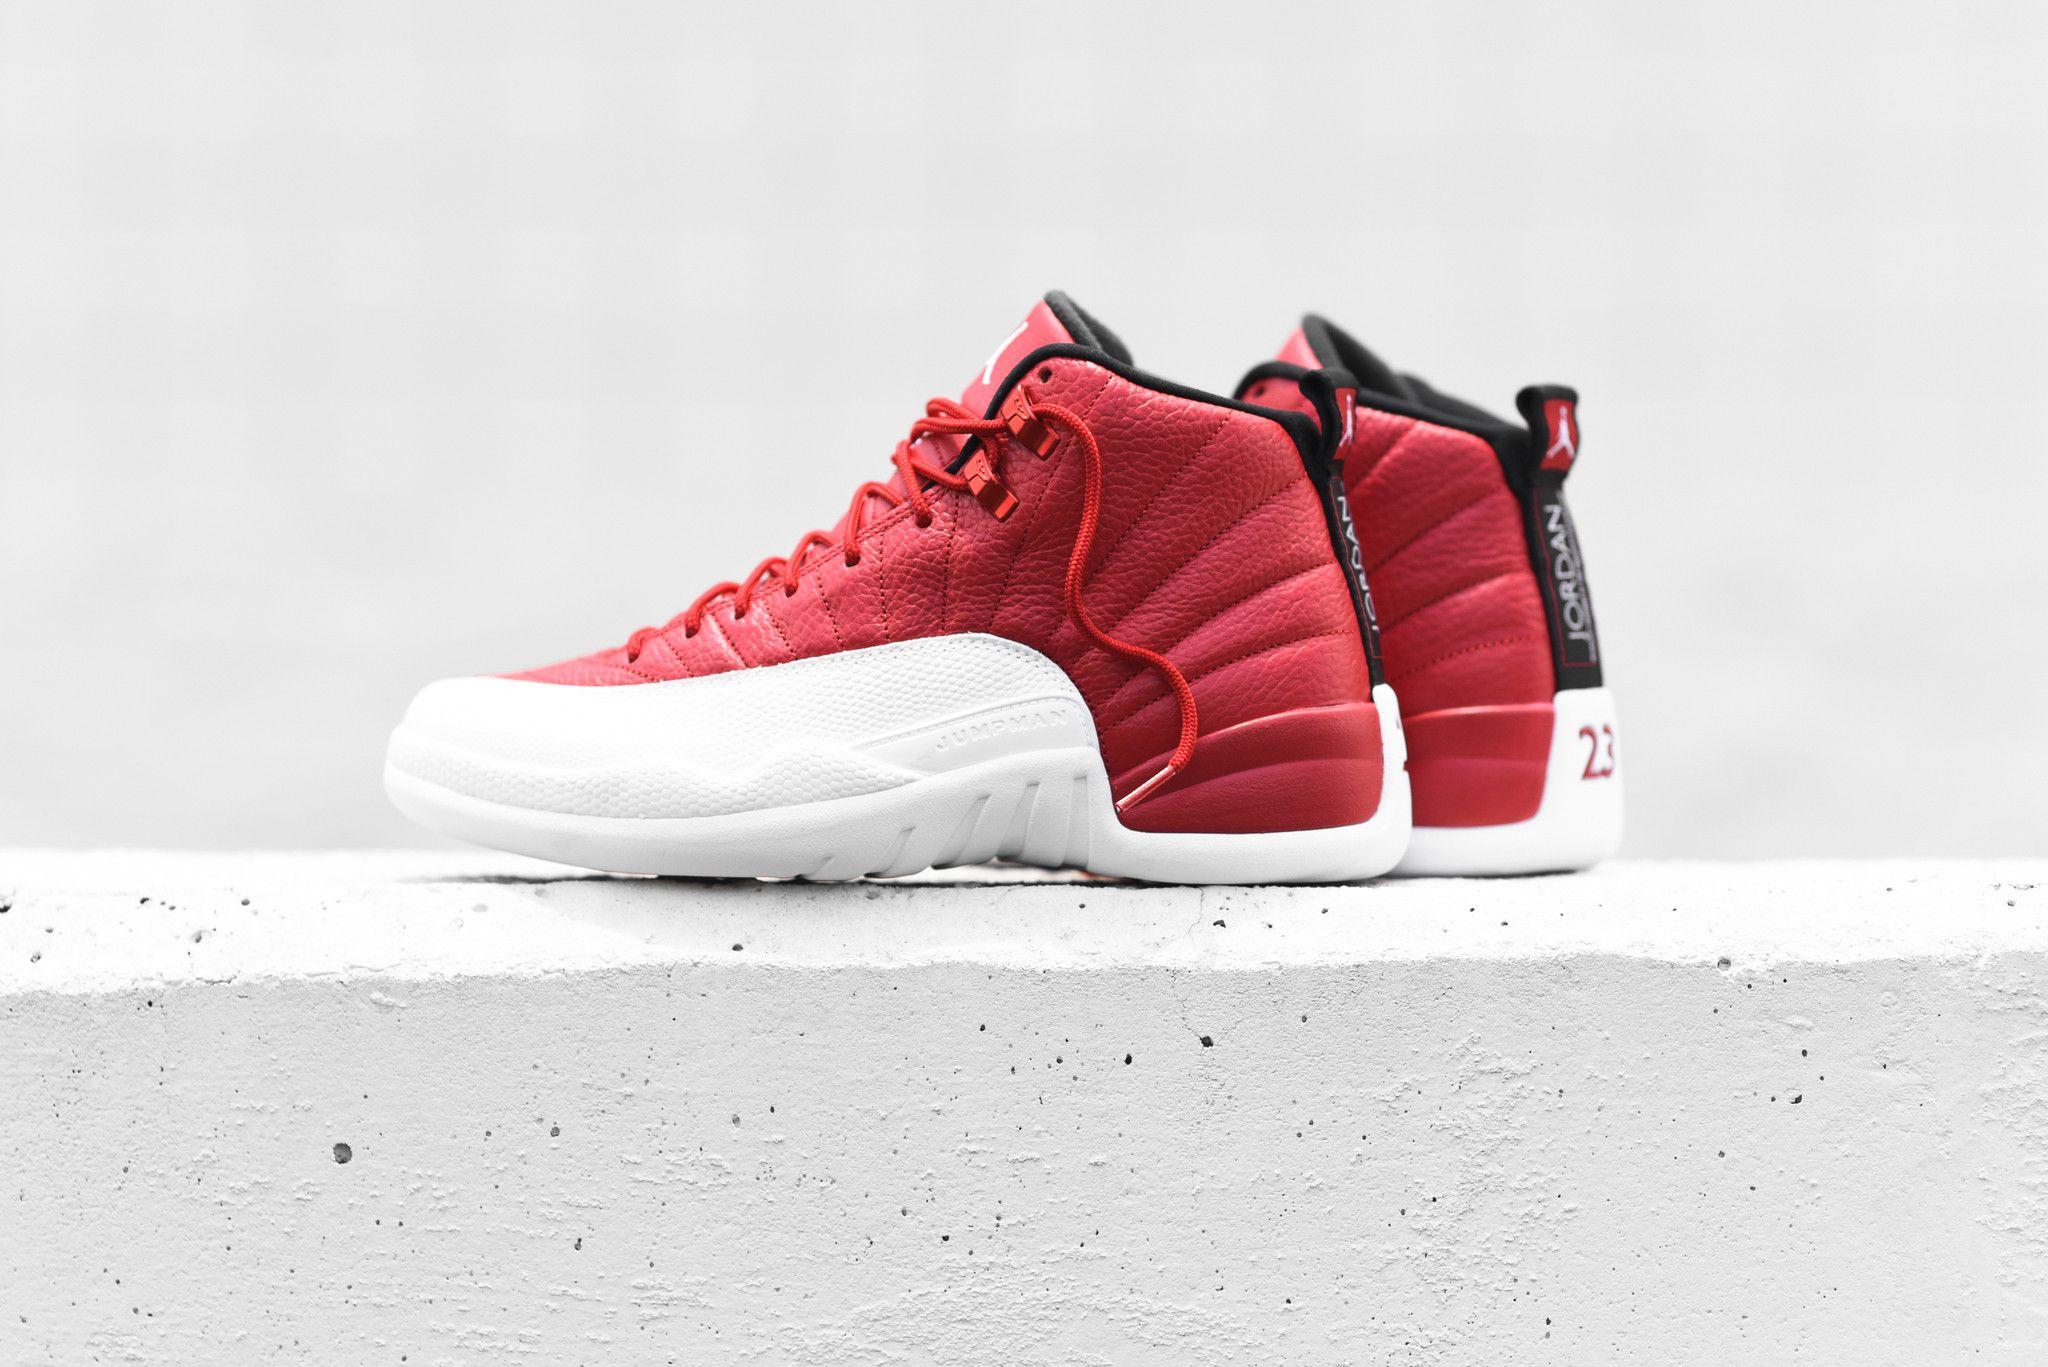 ba6e38150dd5 Get Ready For The Air Jordan 12 Gym Red